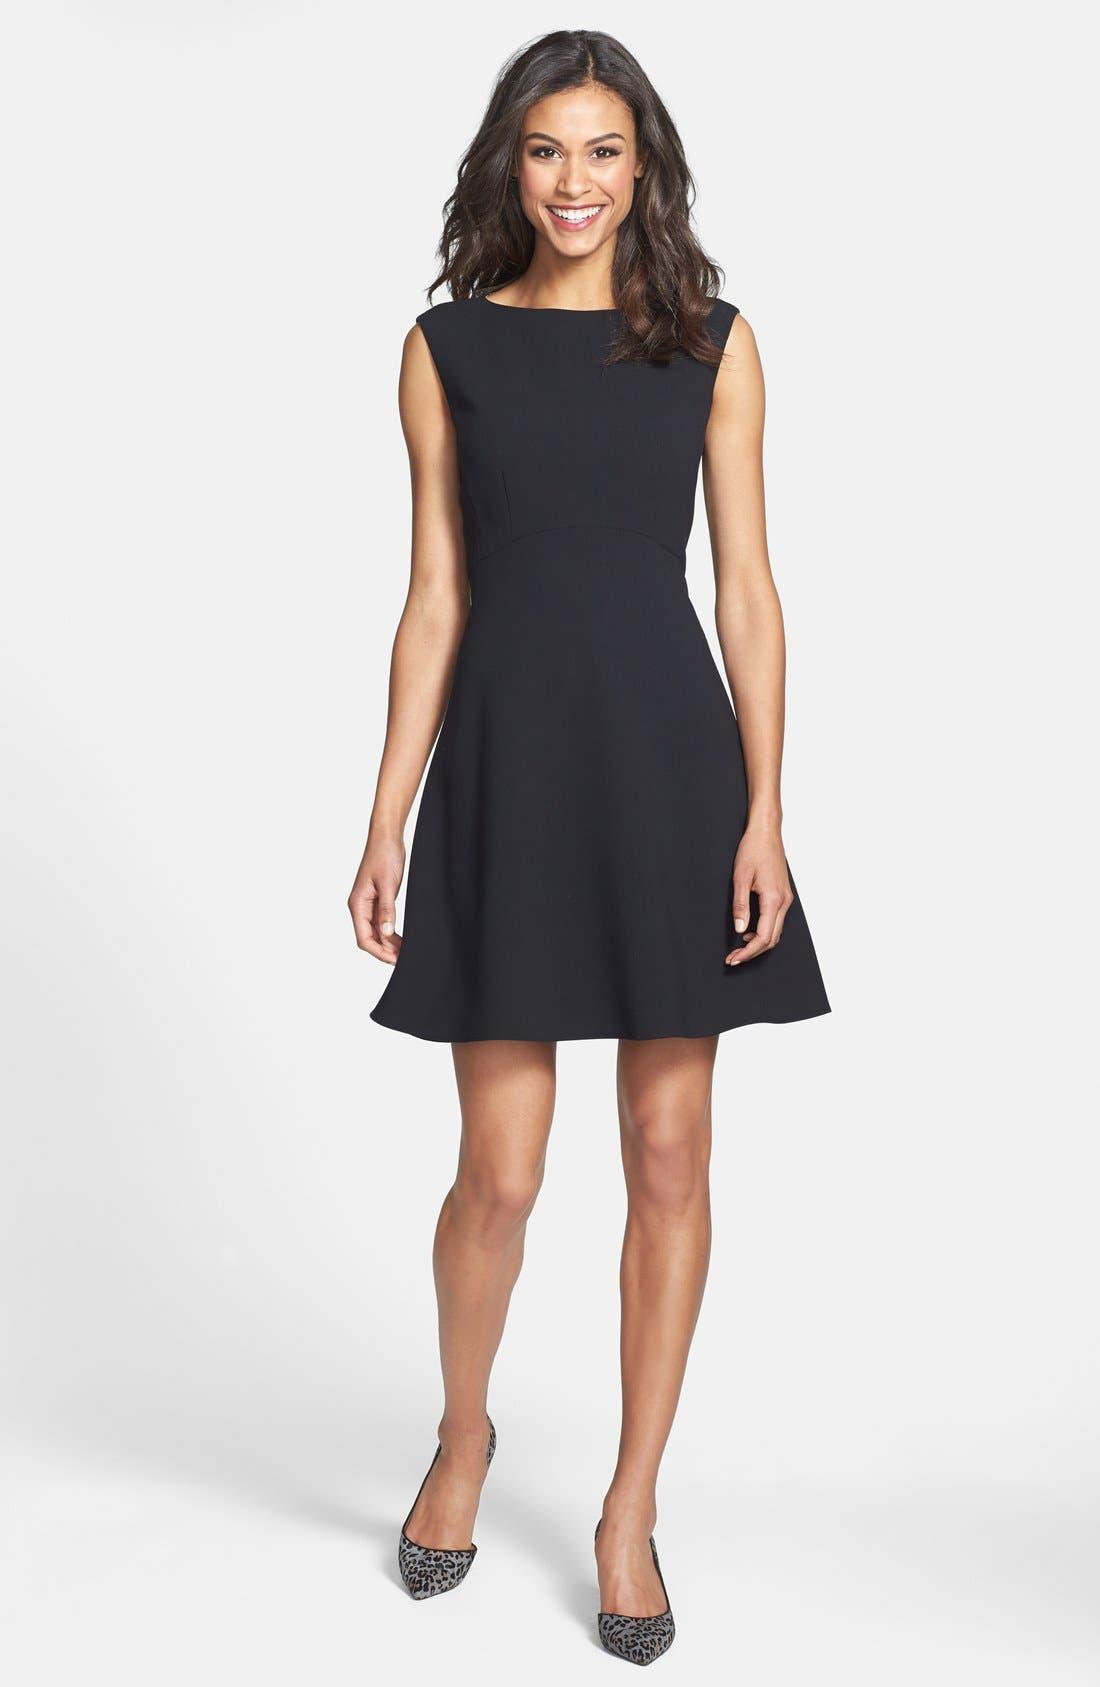 Alternate Image 1 Selected - Tahari Empire Waist Fit & Flare Dress (Petite)